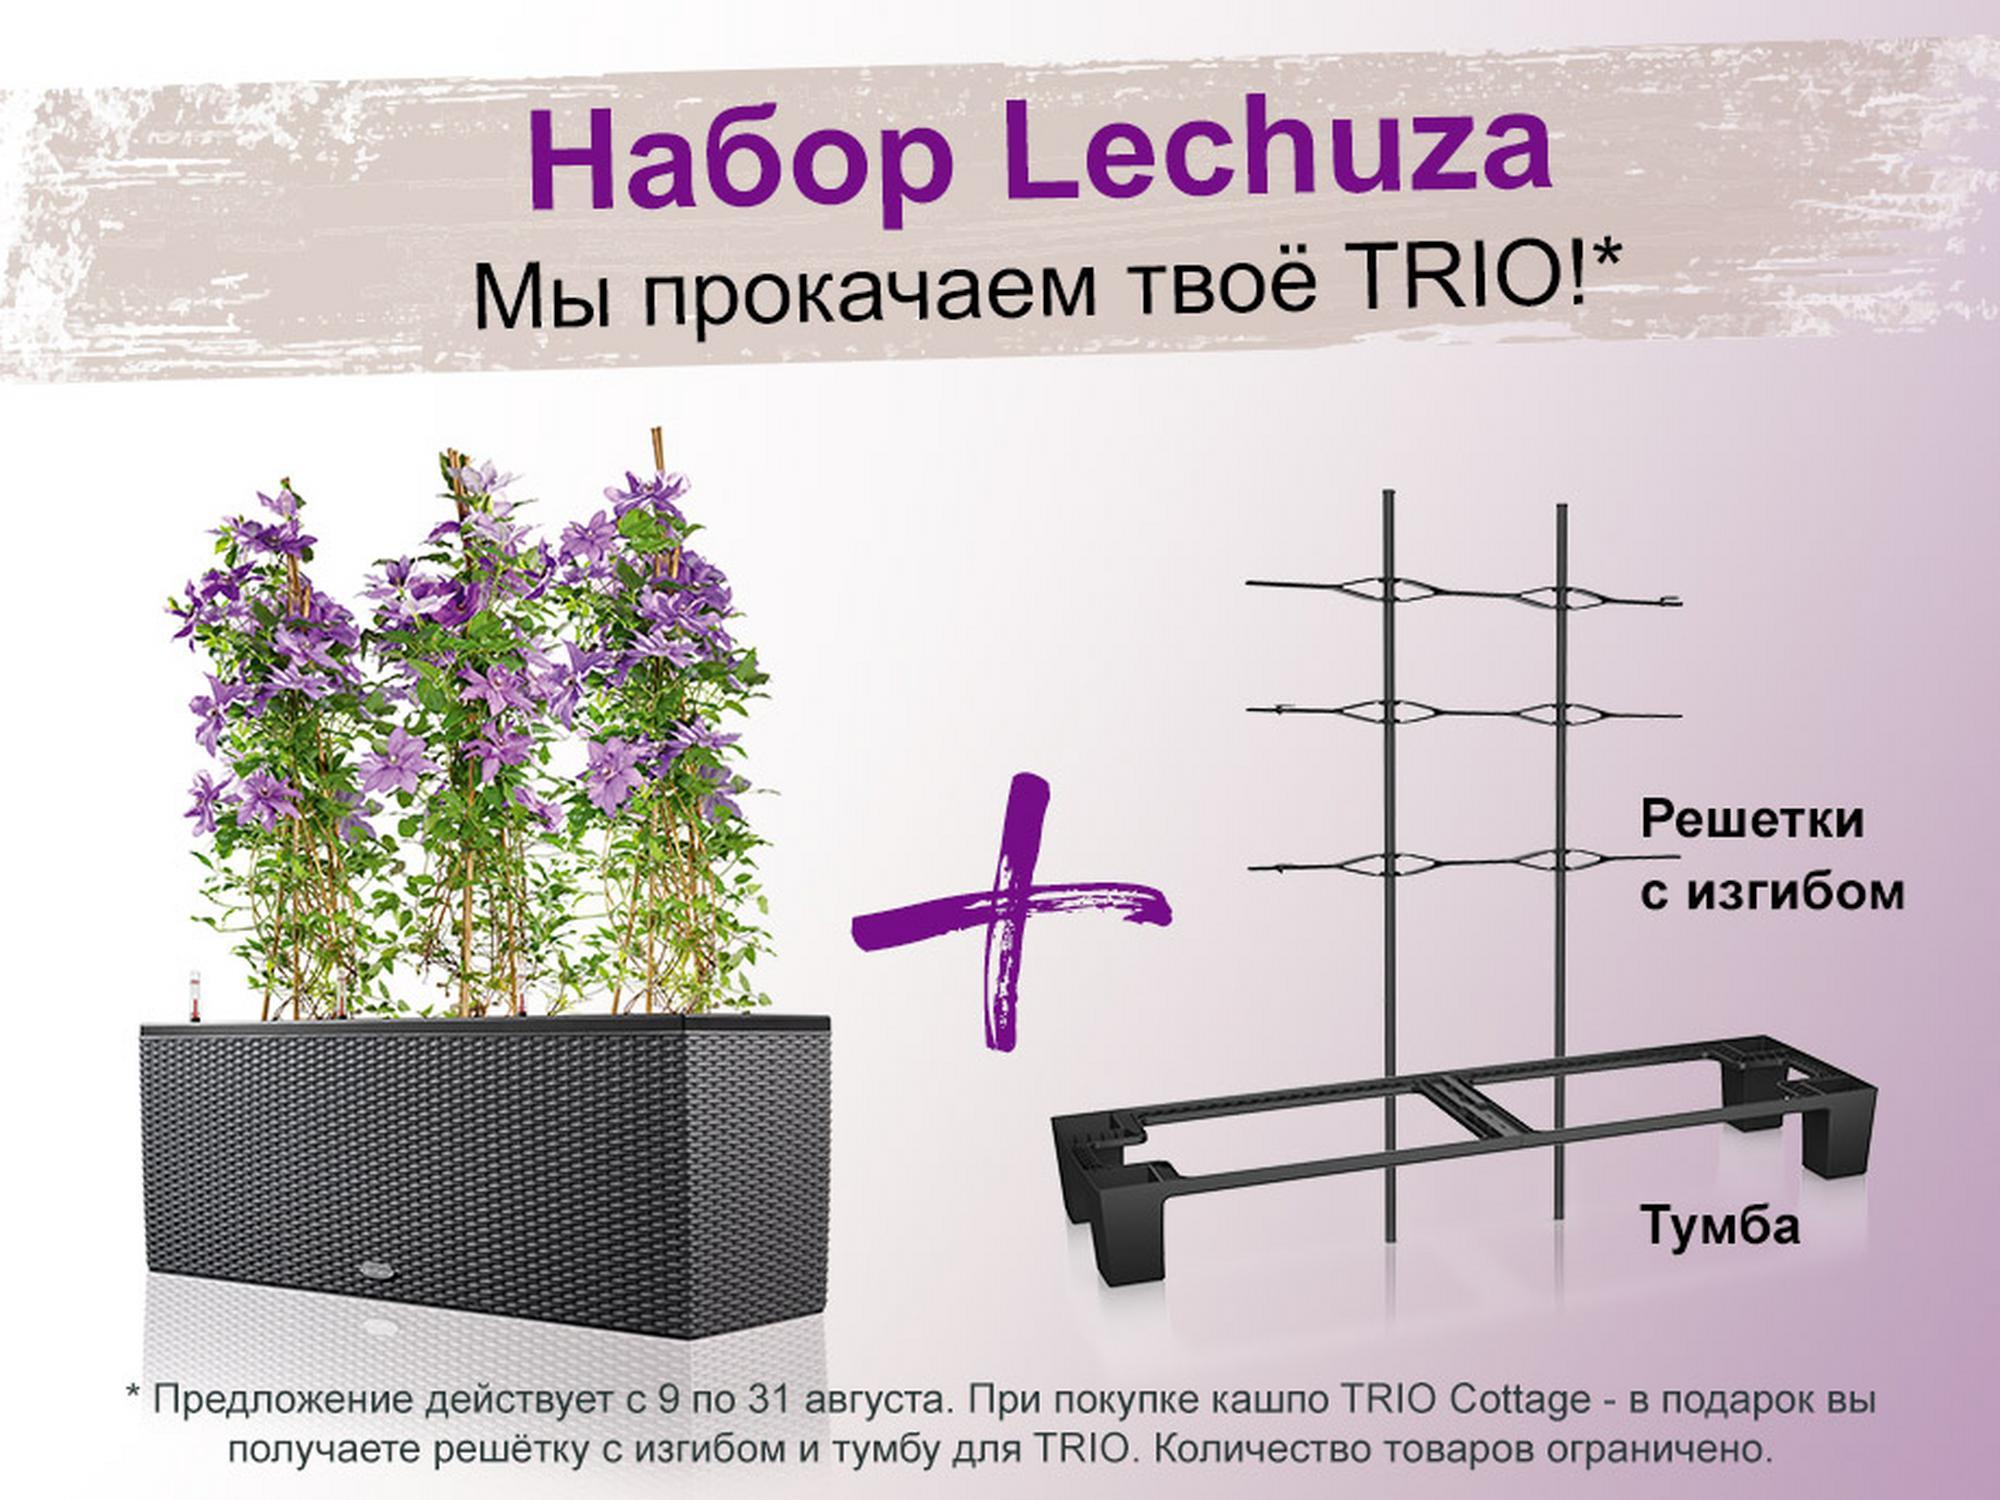 hero_banner_promo_trio_08-2019_xs_ua